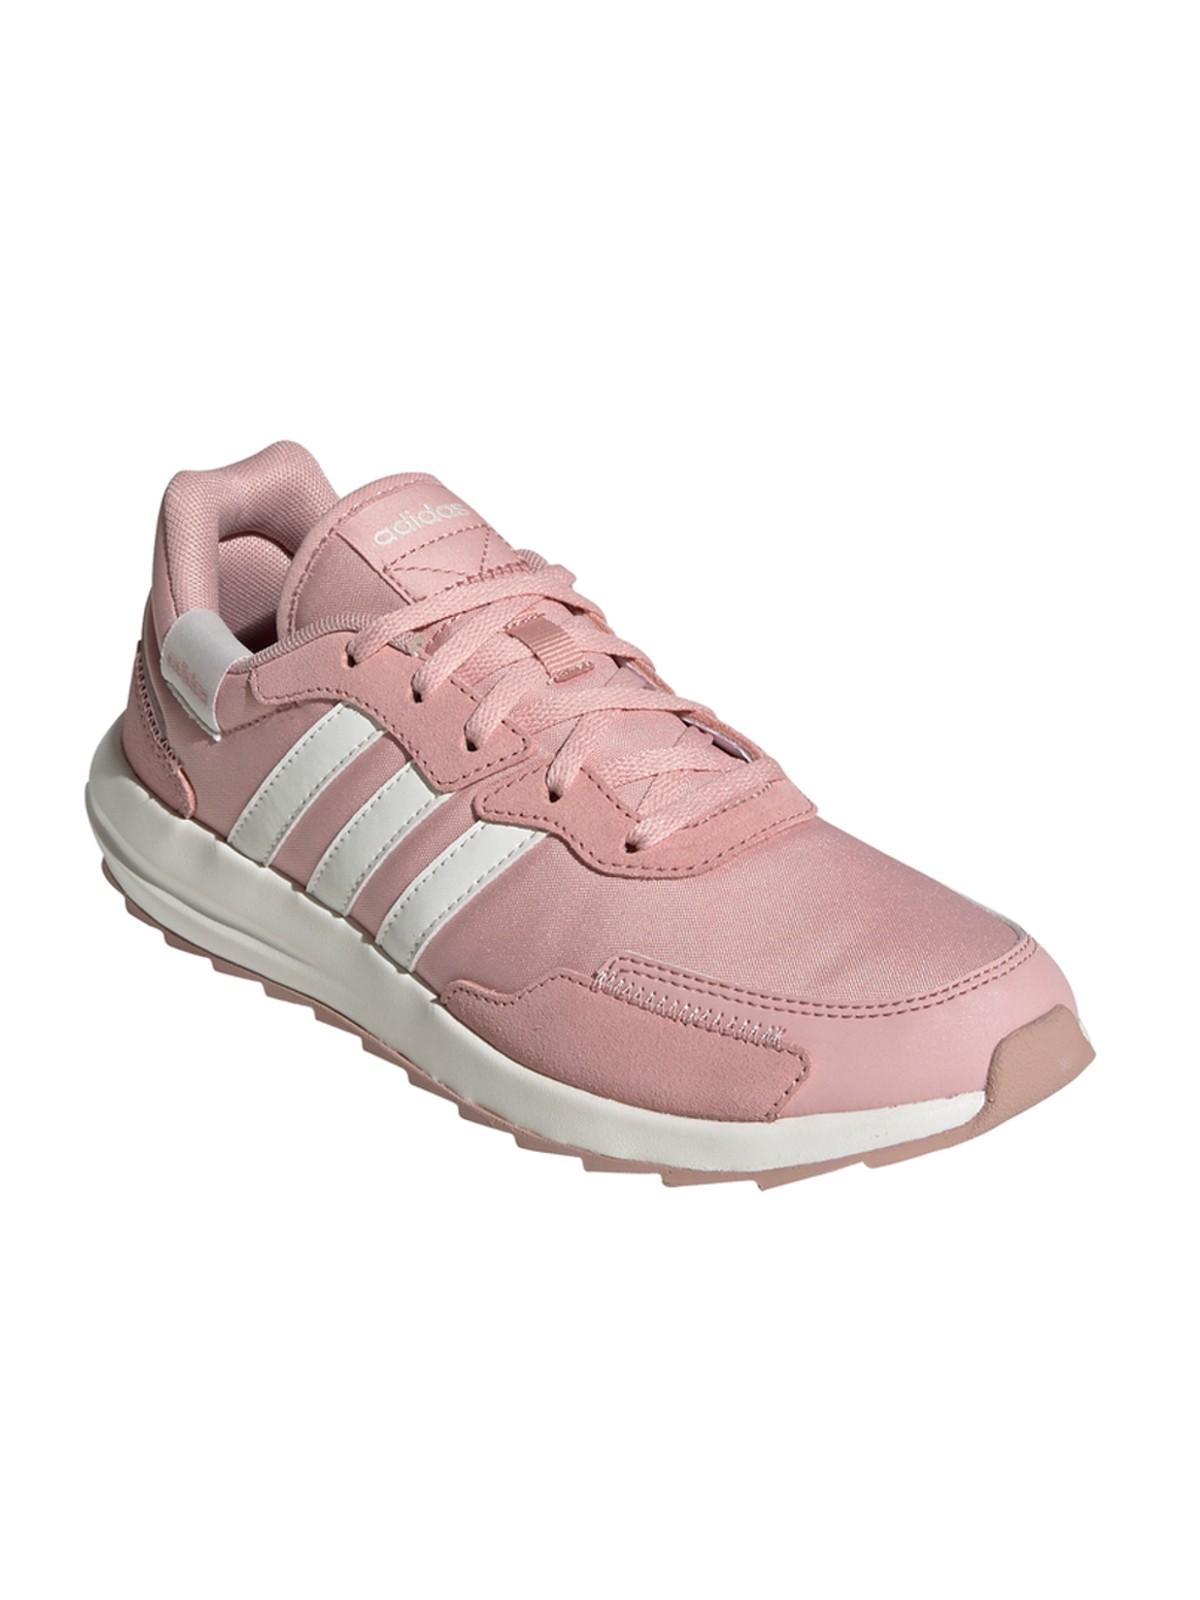 Baskets roses adidas Femme (36-41) - DistriCenter